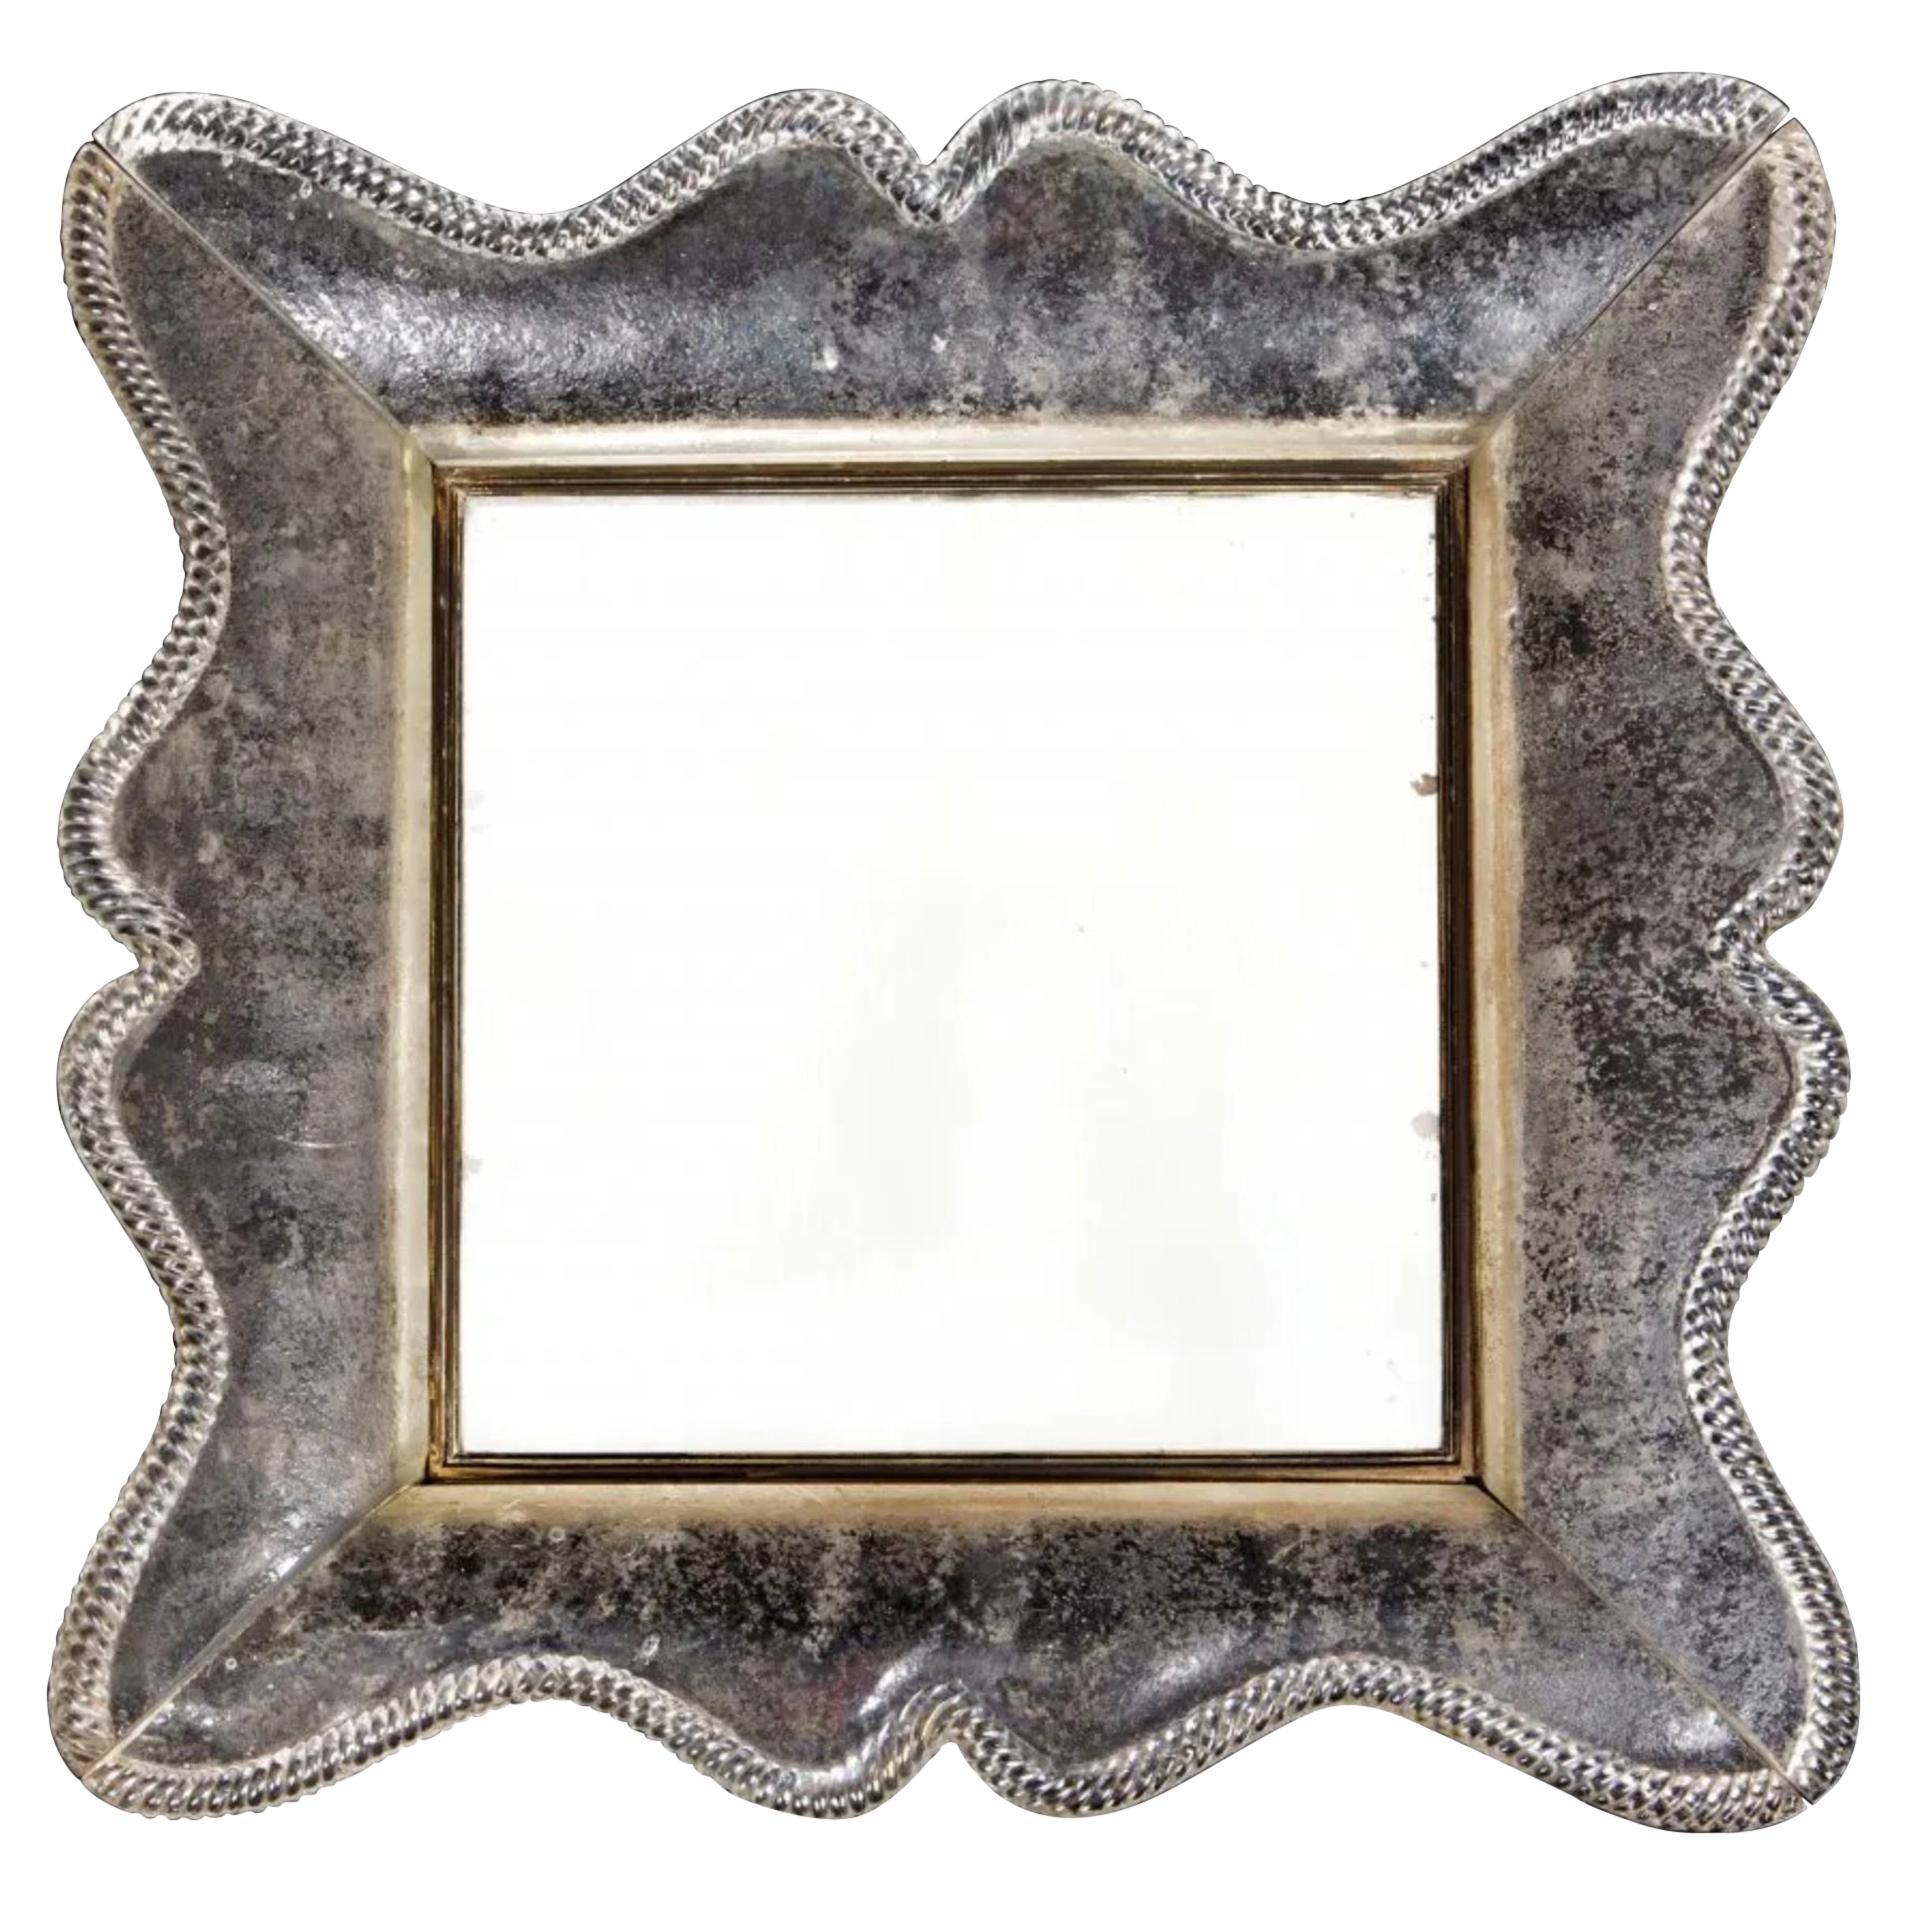 Seguso Vetri d'Arte Rare & Important Smoked Glass Mirror, Italy, 1940s